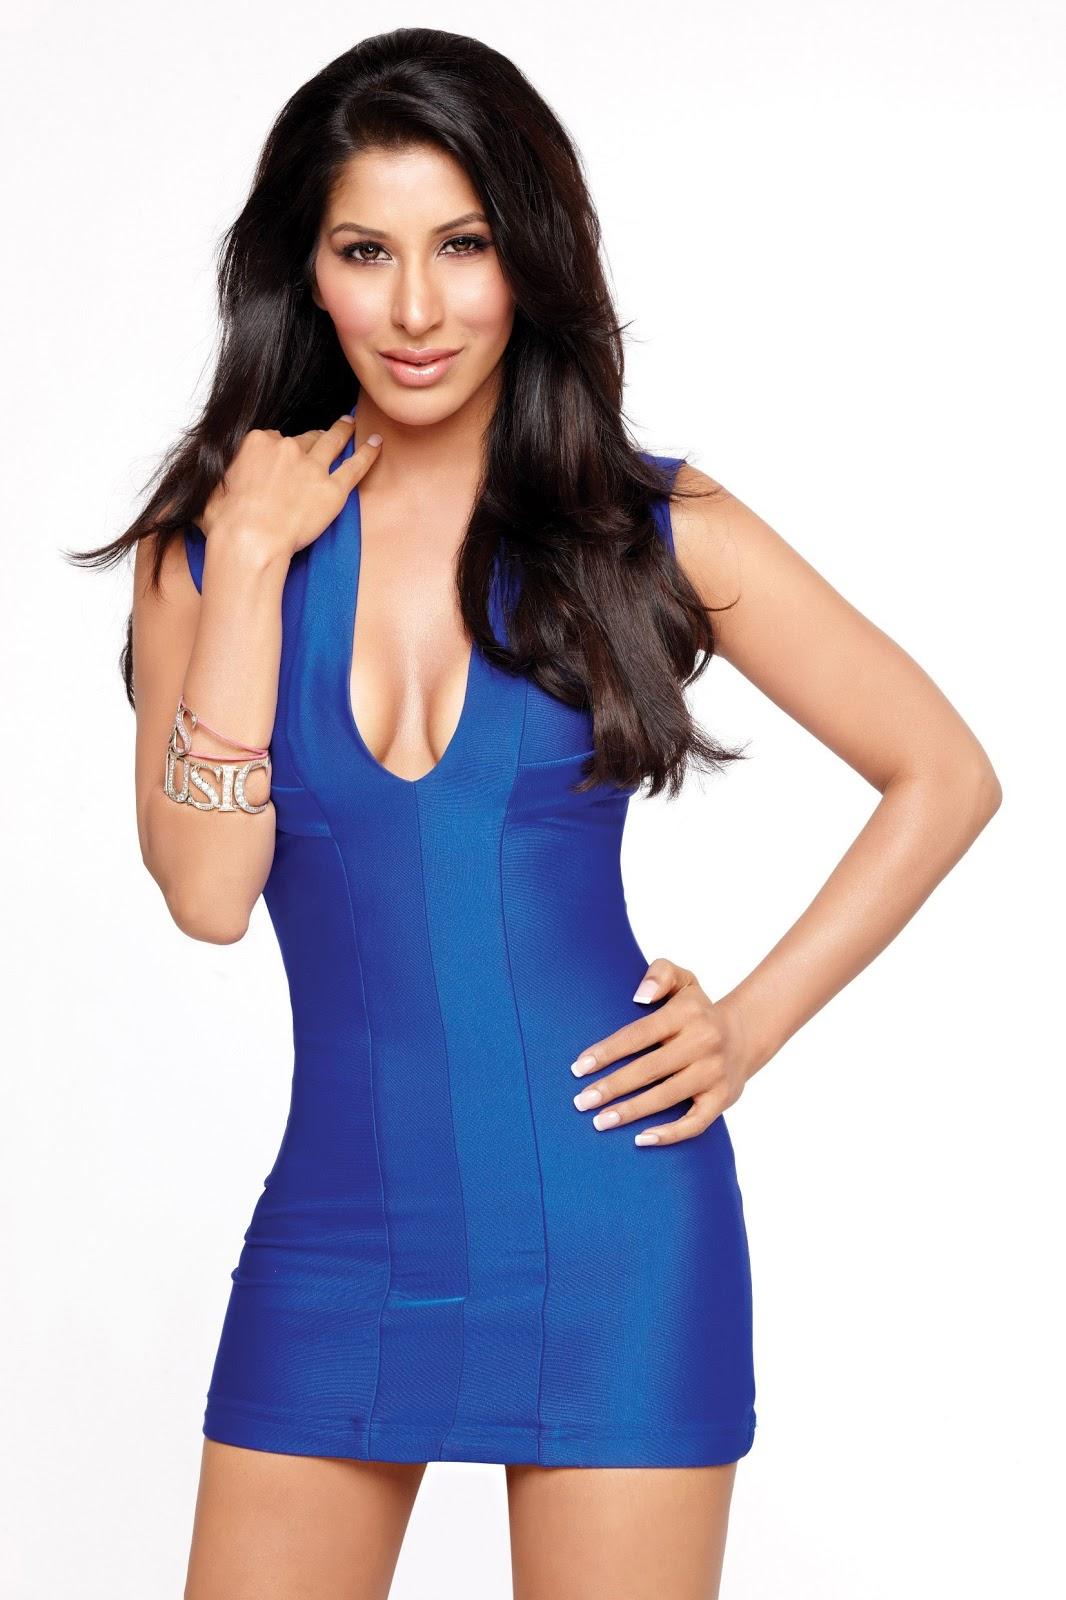 Sophie Chaudhary   Celebrities Photos Hub